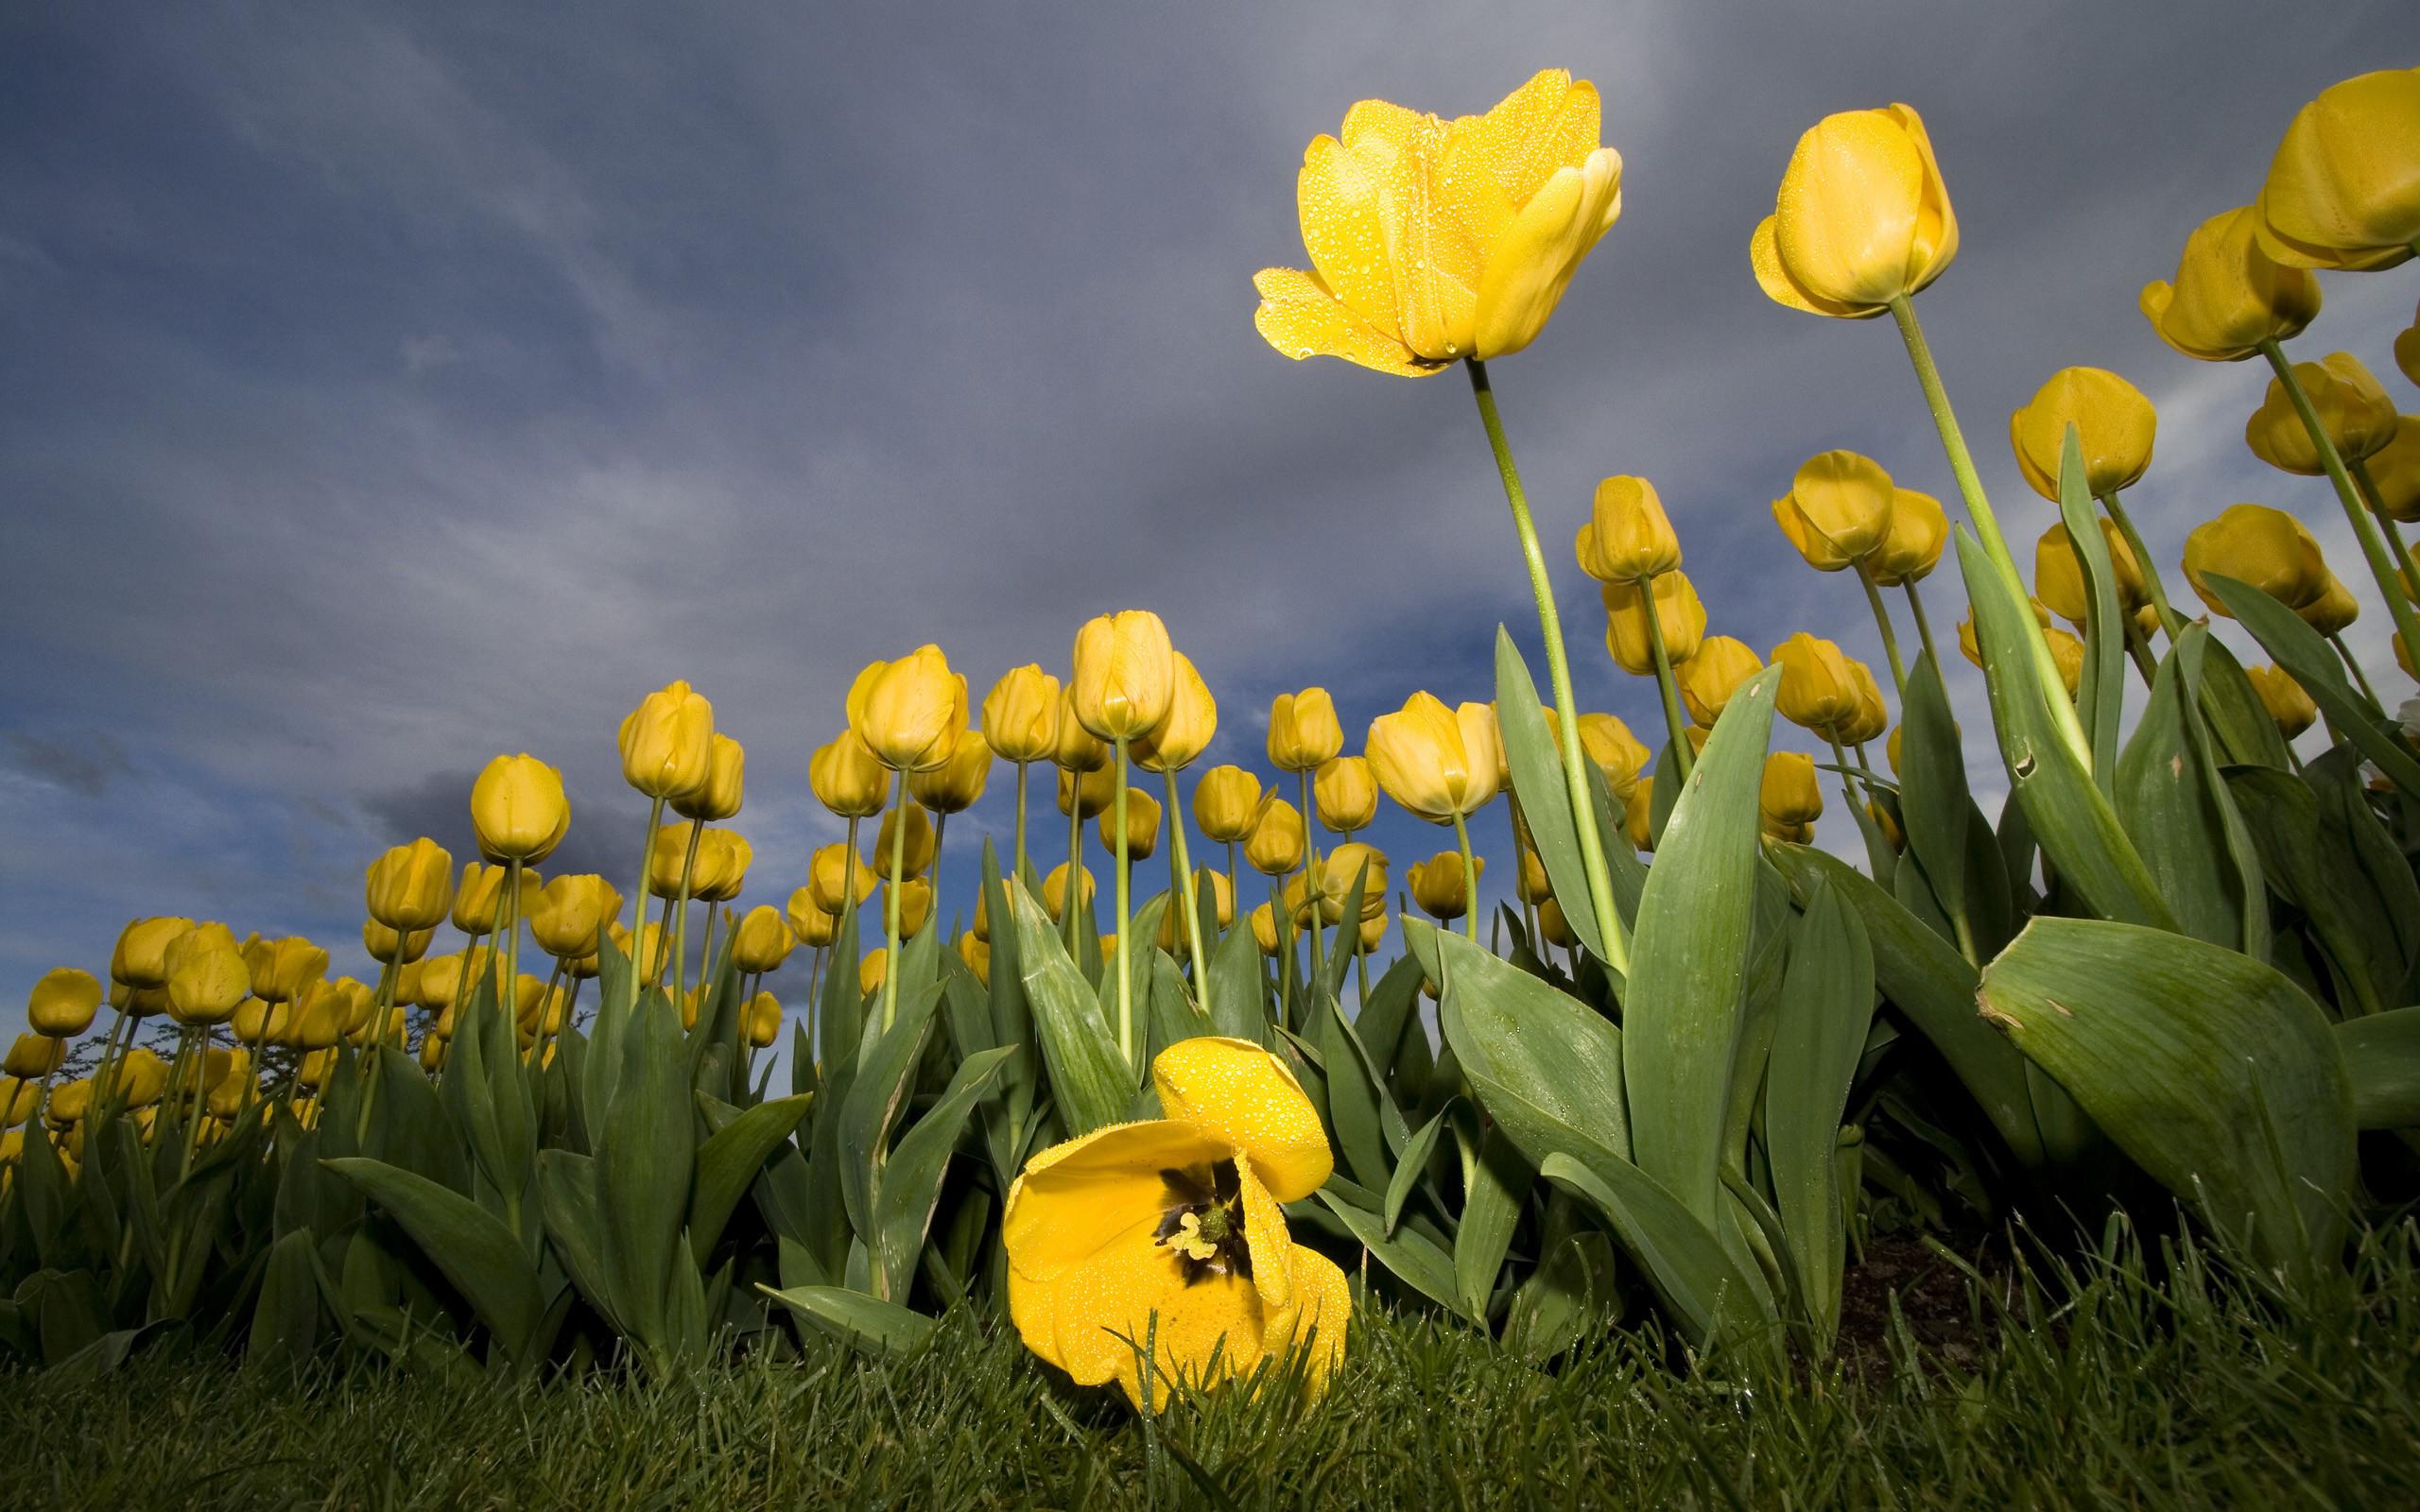 nature wallpaper,flower,yellow,plant,tulip,spring